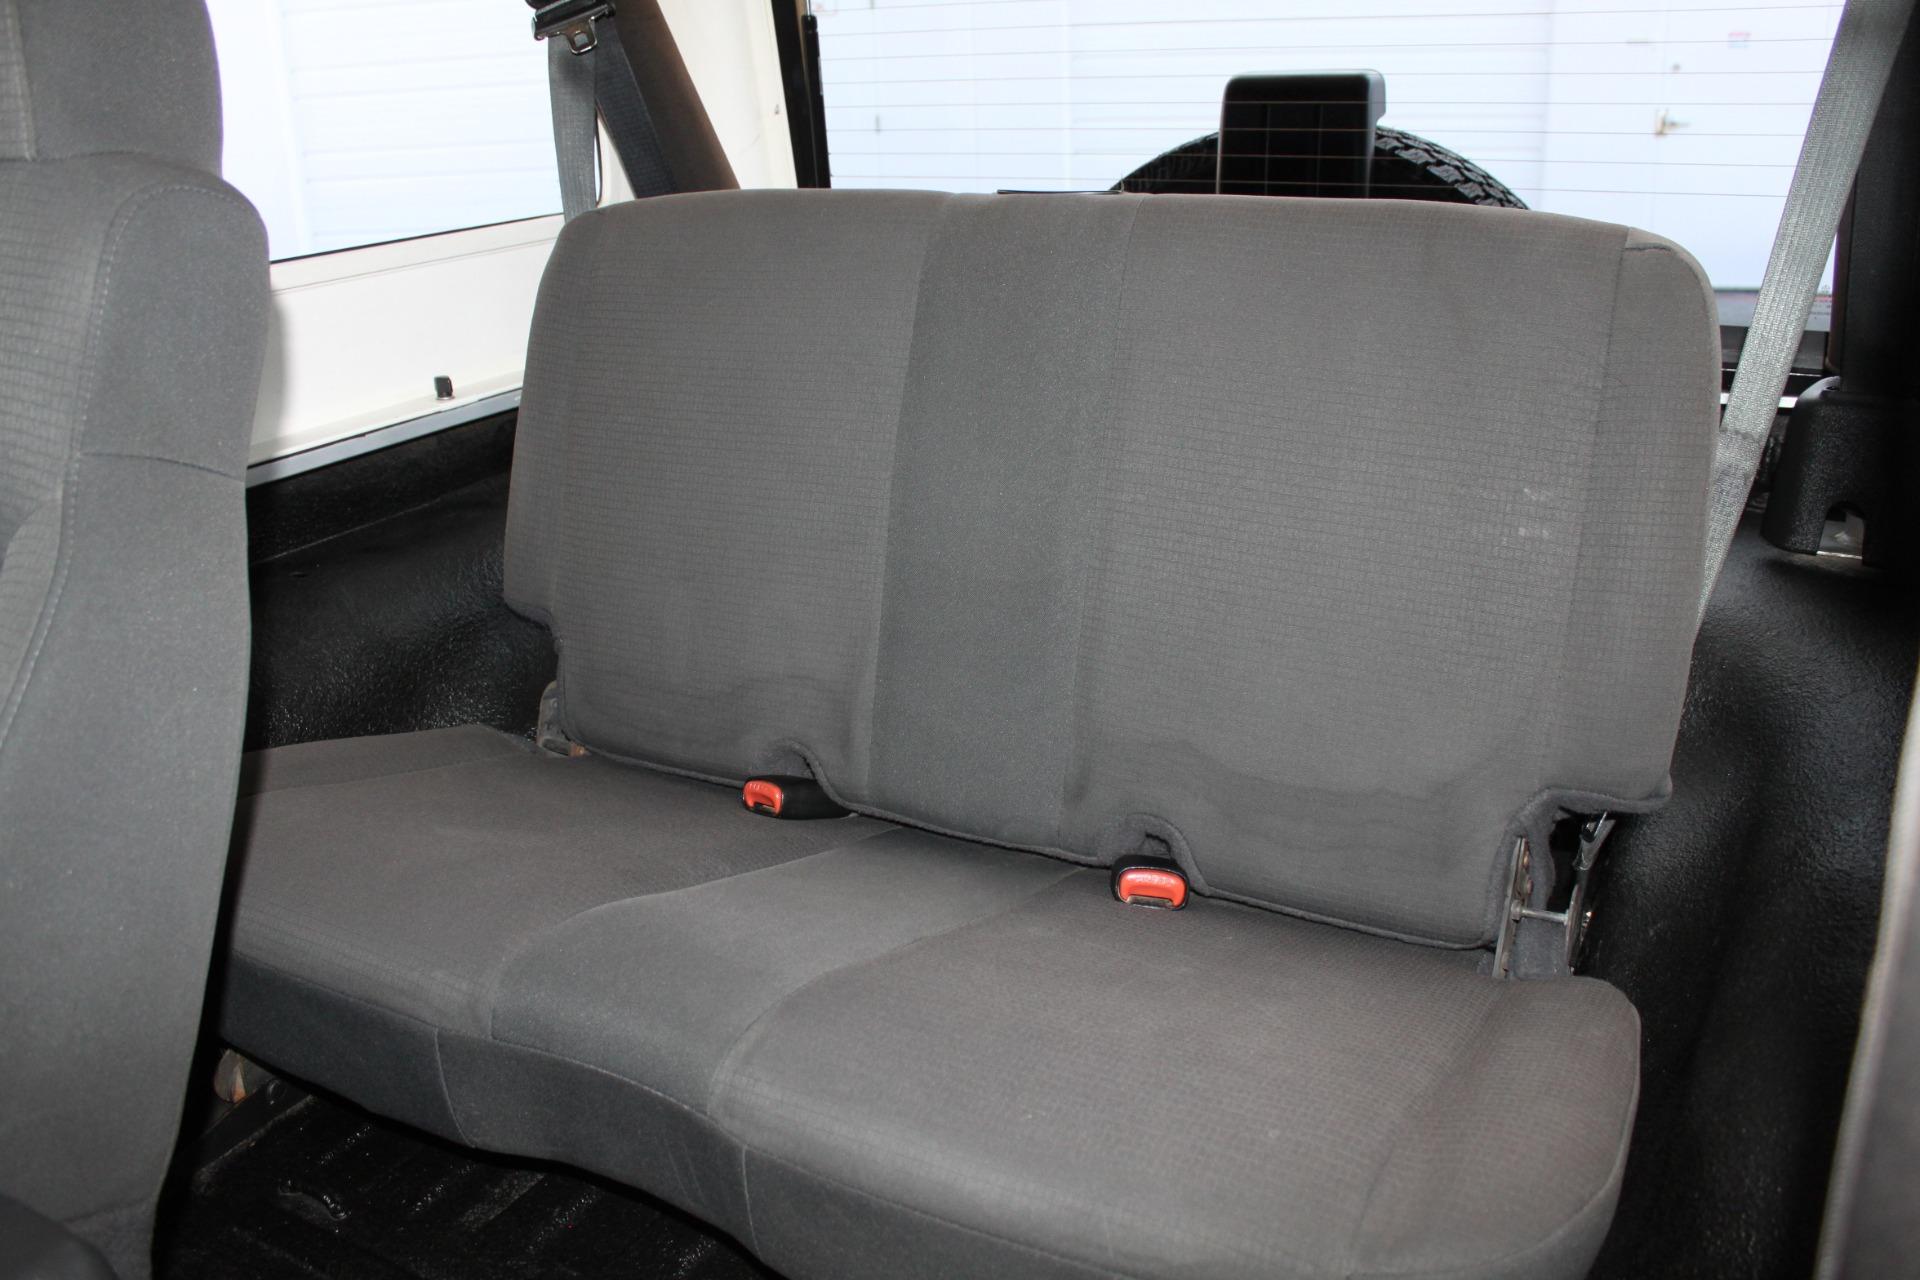 Used-2006-Jeep-Wrangler-Unlimited-LWB-Lamborghini